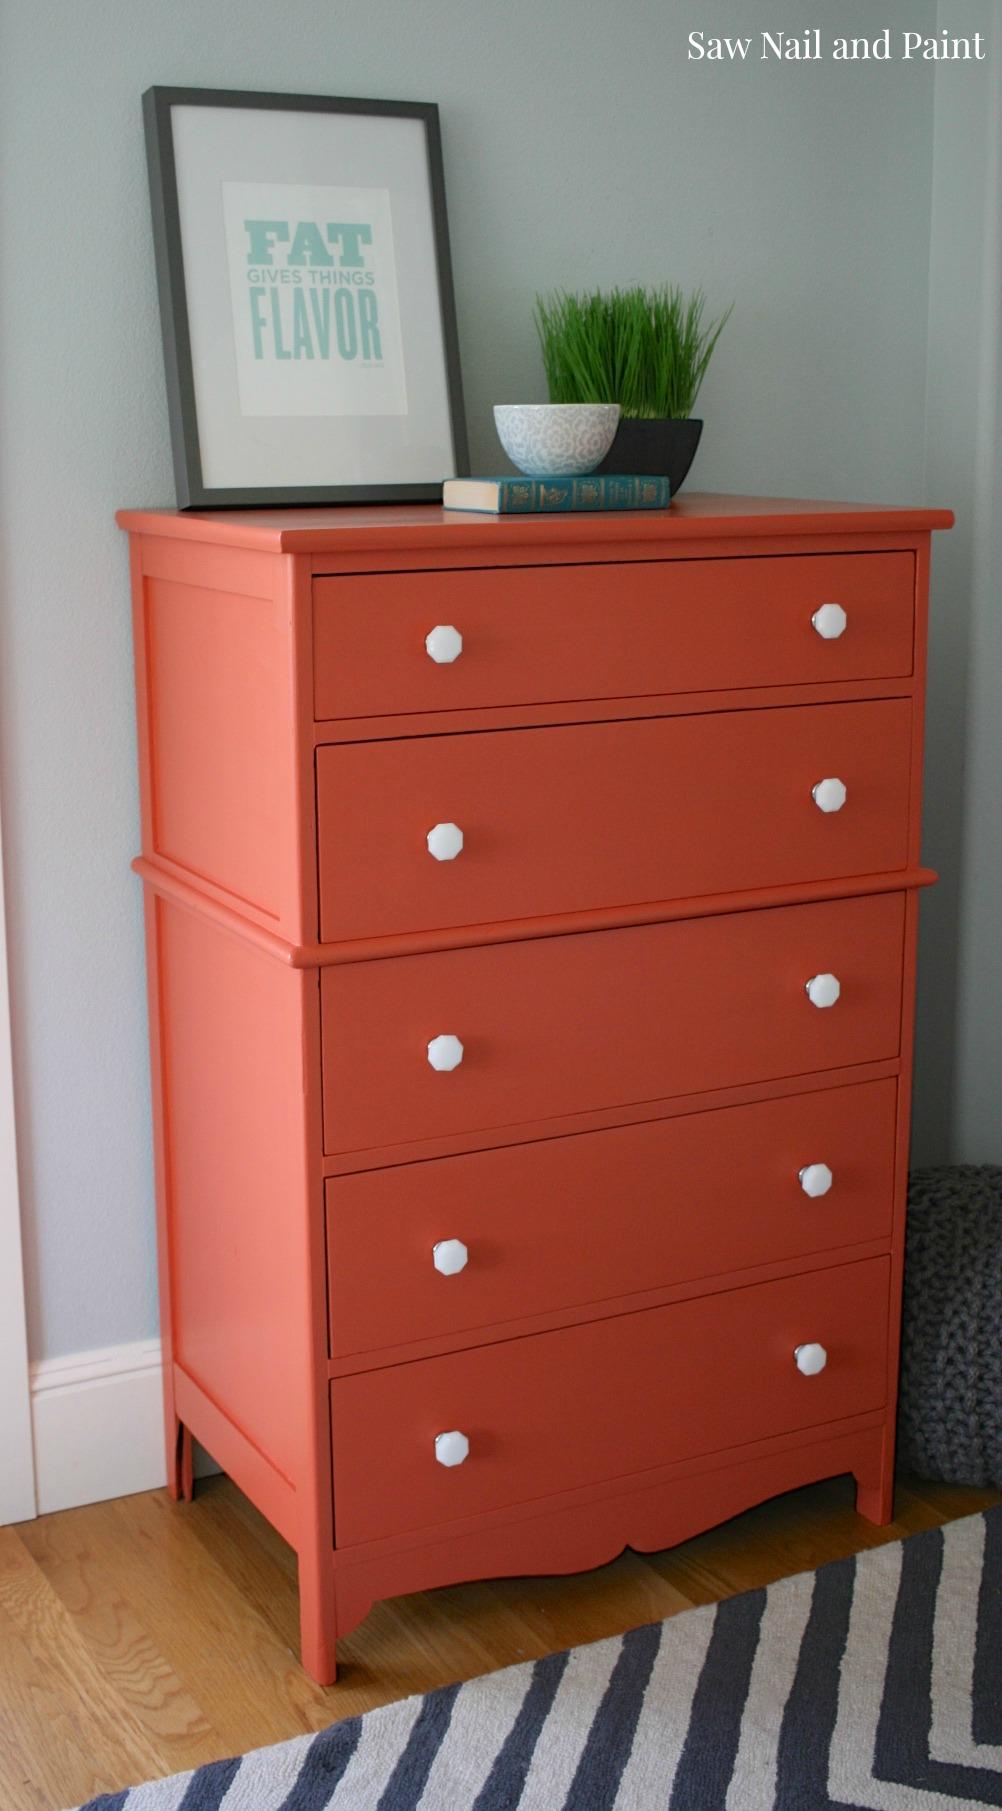 orange dresser with milk glass knobs  before and after  saw nail  - orange dresser side